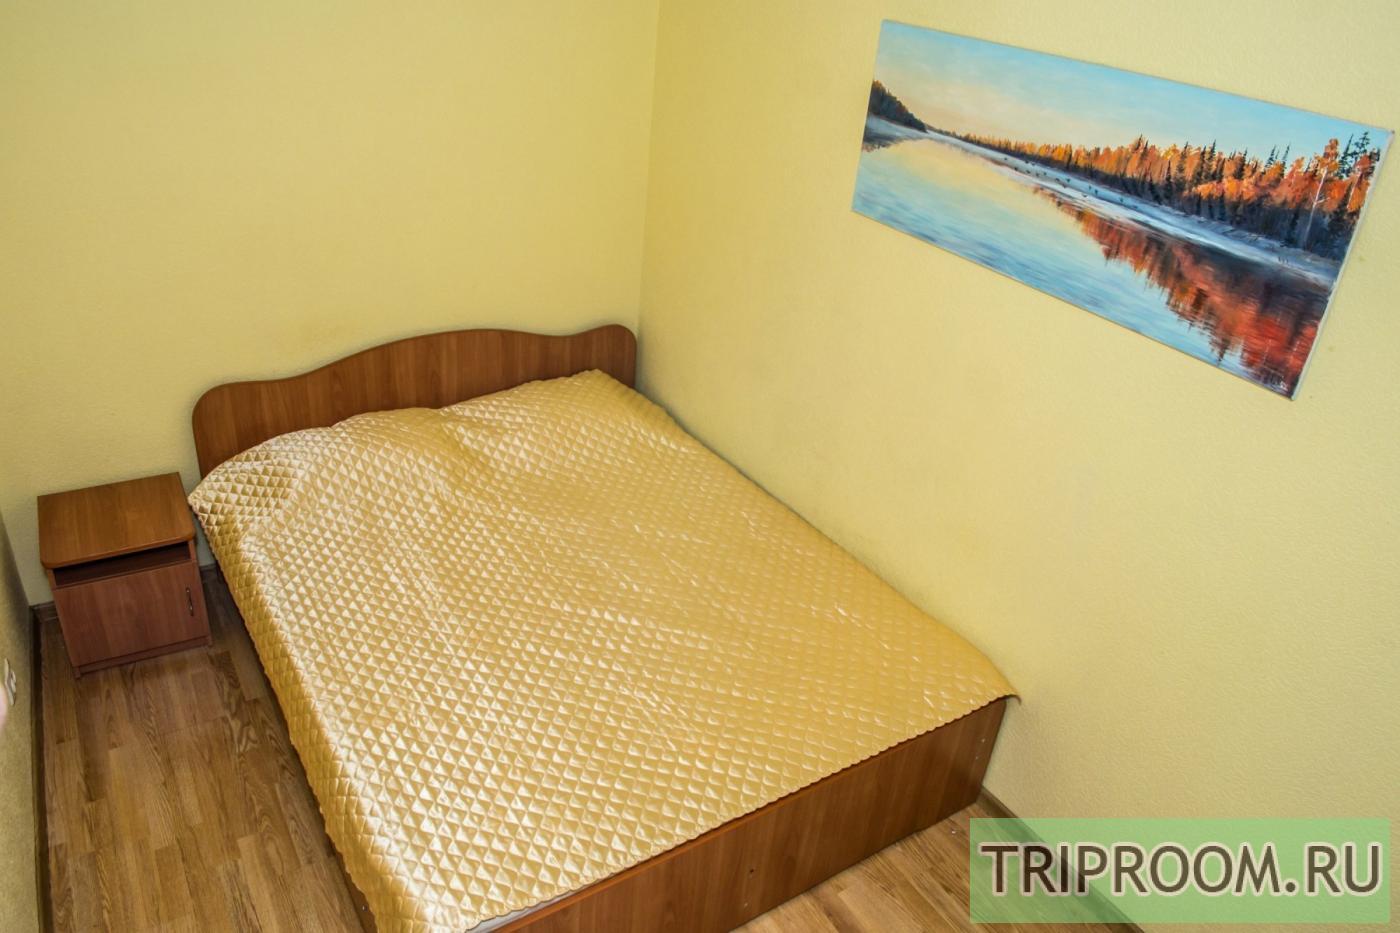 2-комнатная квартира посуточно (вариант № 20494), ул. Газеты звезда, фото № 7